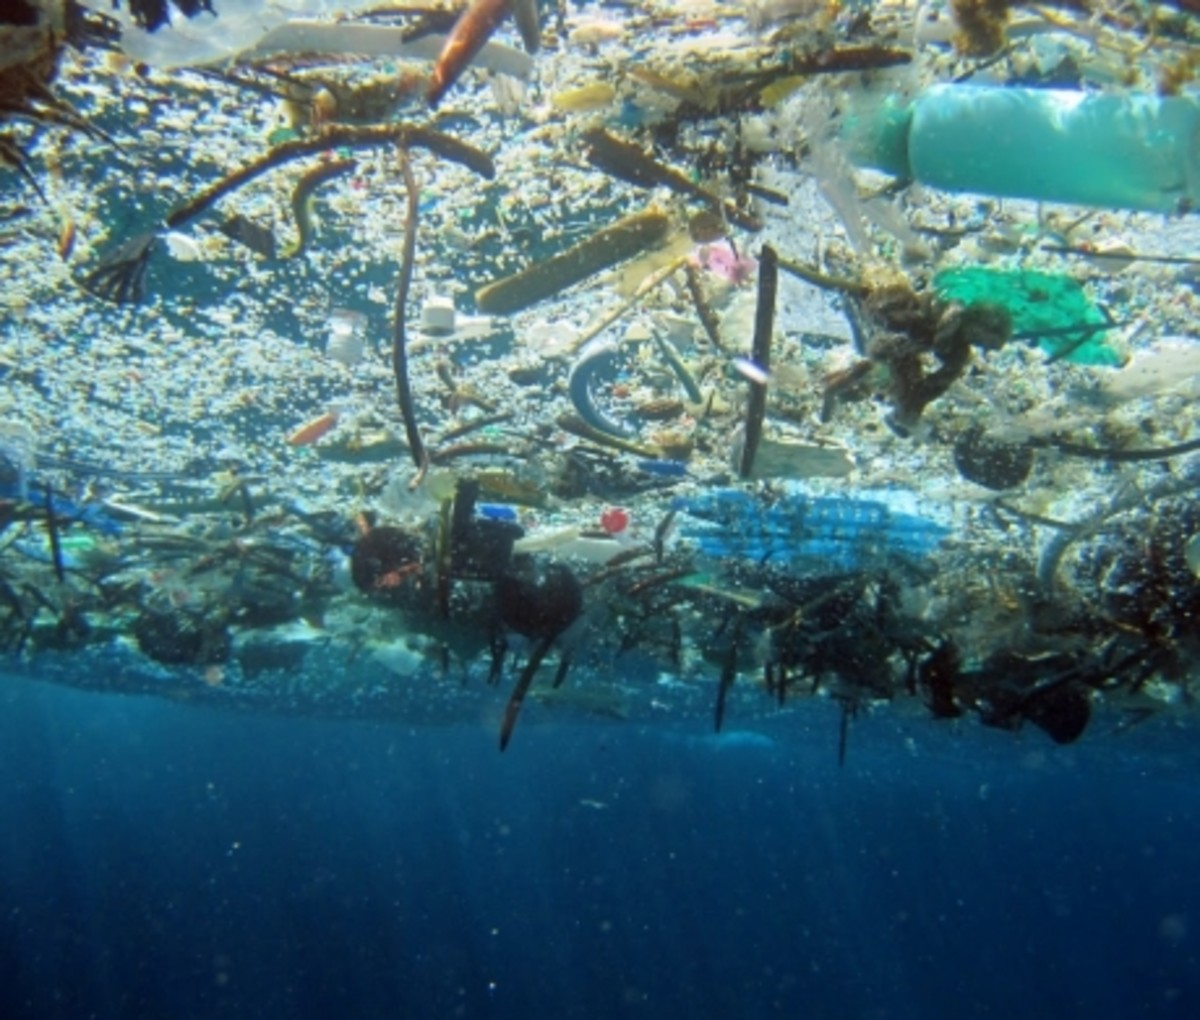 Ocean debris is a global environmental crisis.